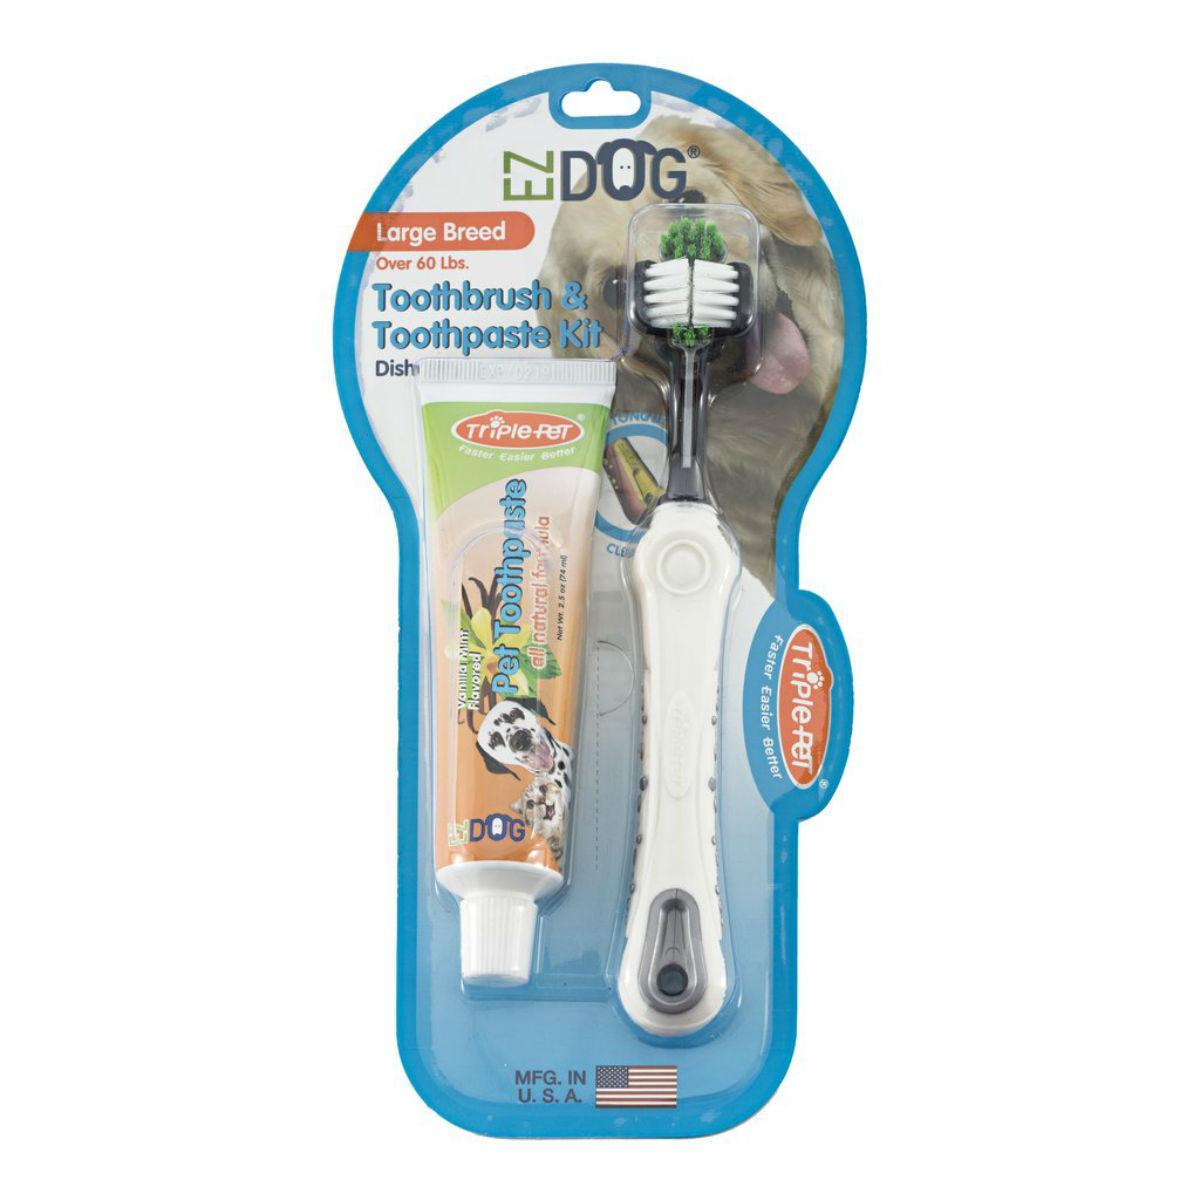 EZ Dog 3-Sided Toothbrush & Natural Toothpaste Kit for Large Dog Breeds - Vanilla Flavor